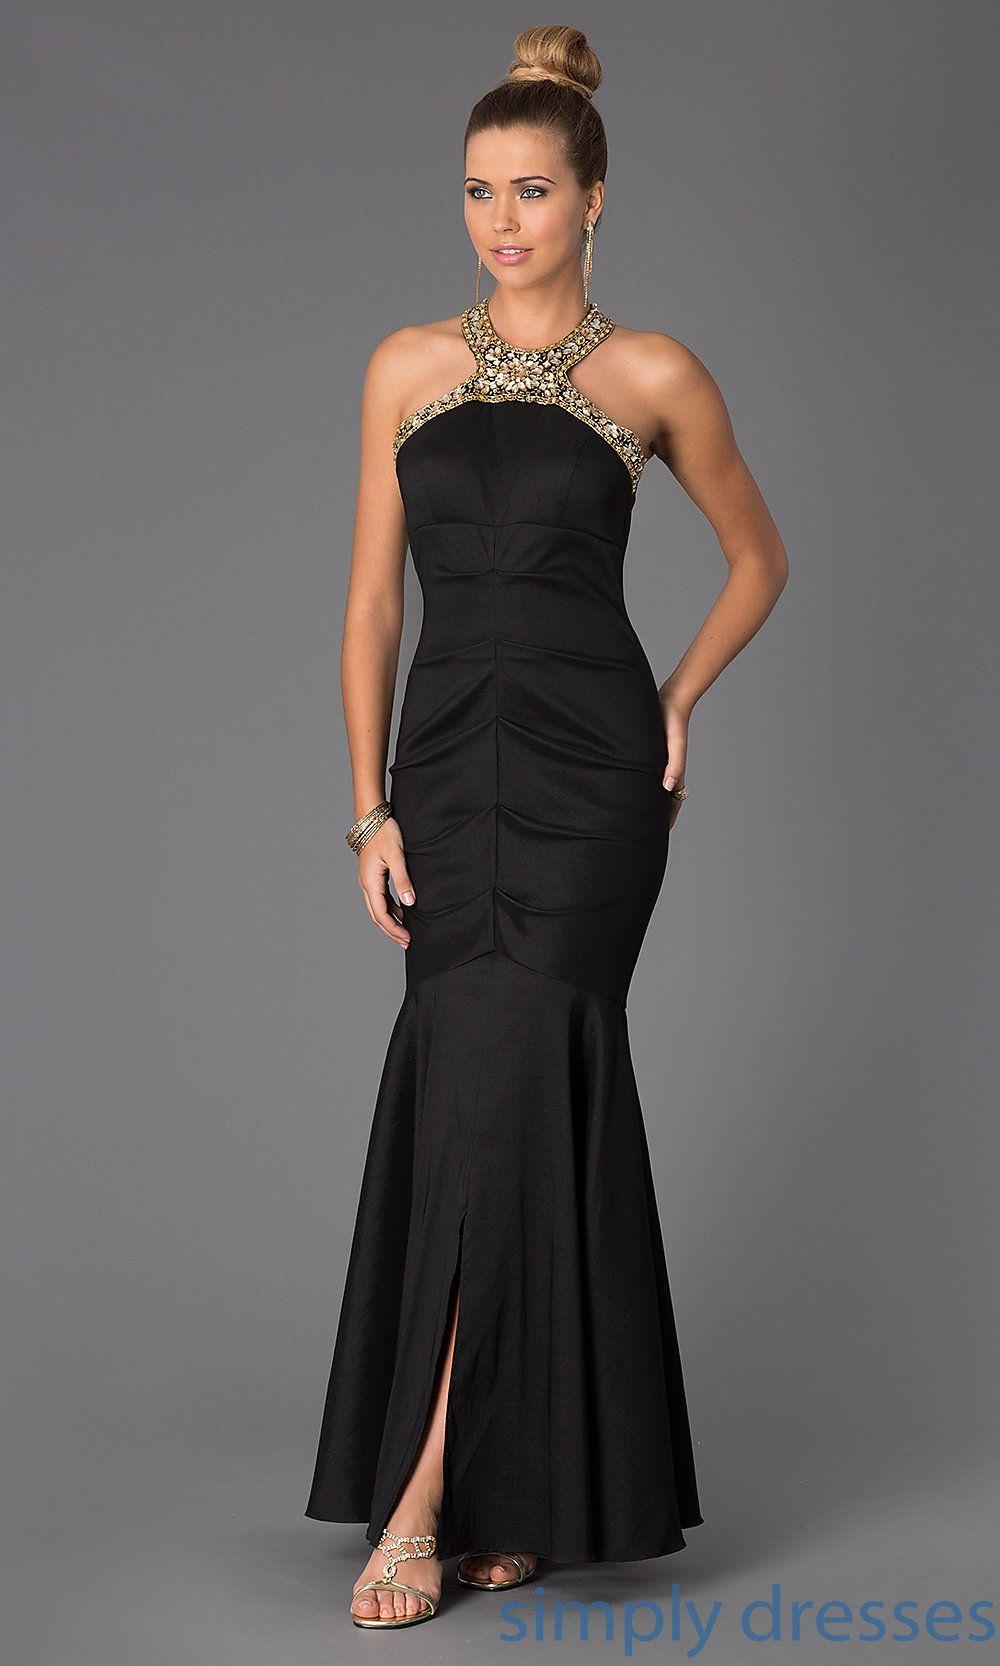 Prom xscape dresses